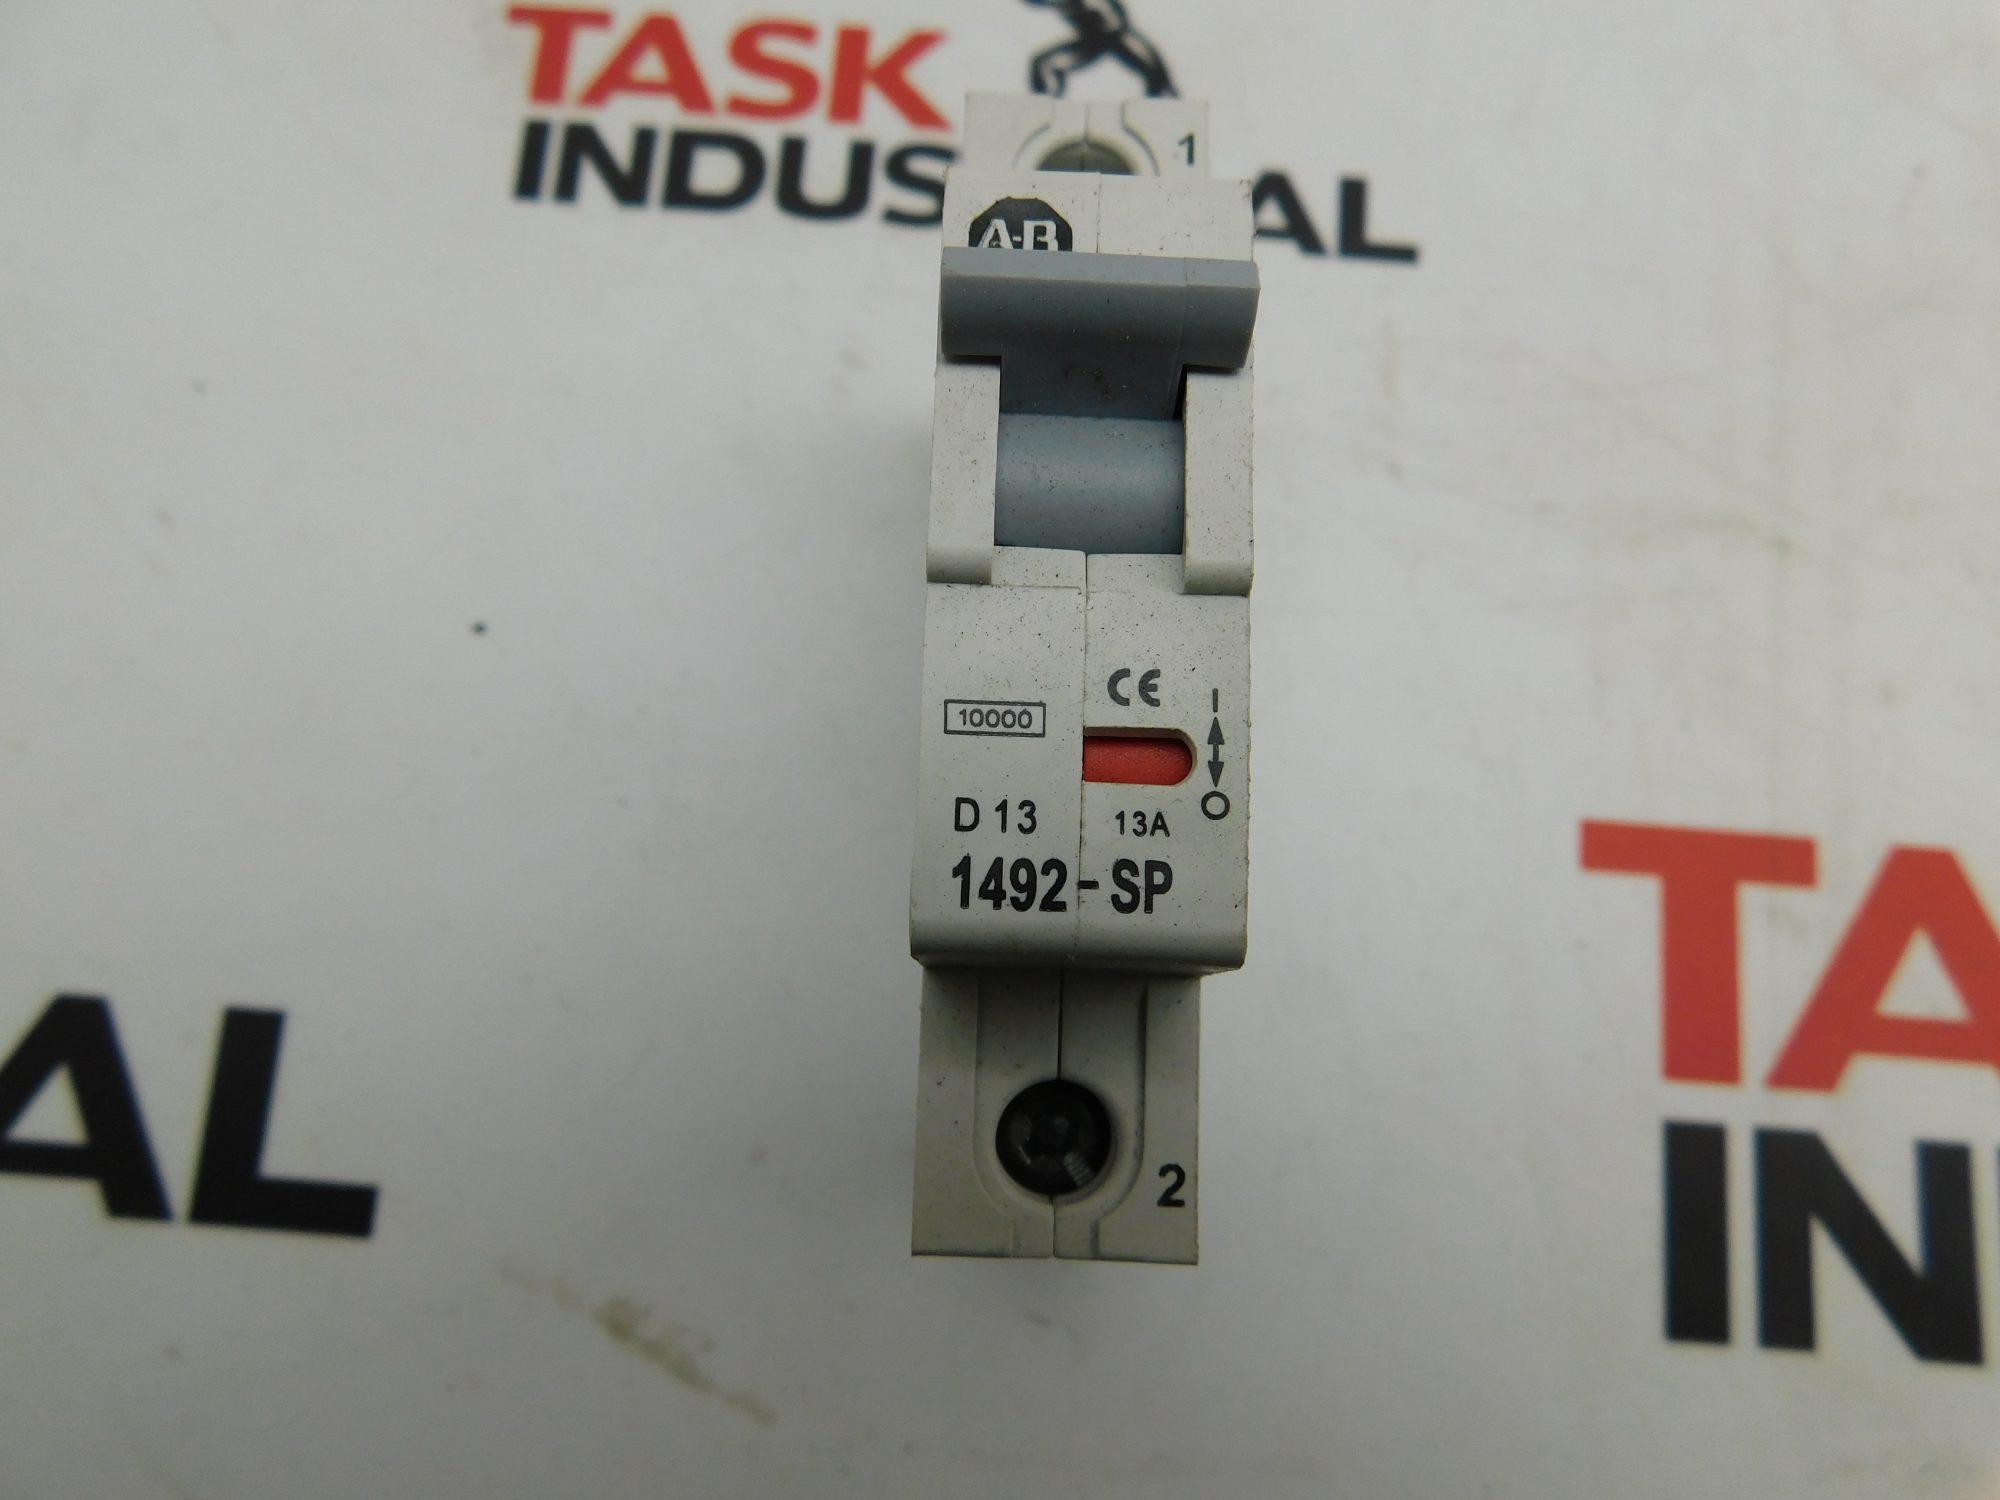 Allen-Bradley CAT No. 1492-SP1D130 Series C 240/415VAC 1 Pole Circuit Breaker